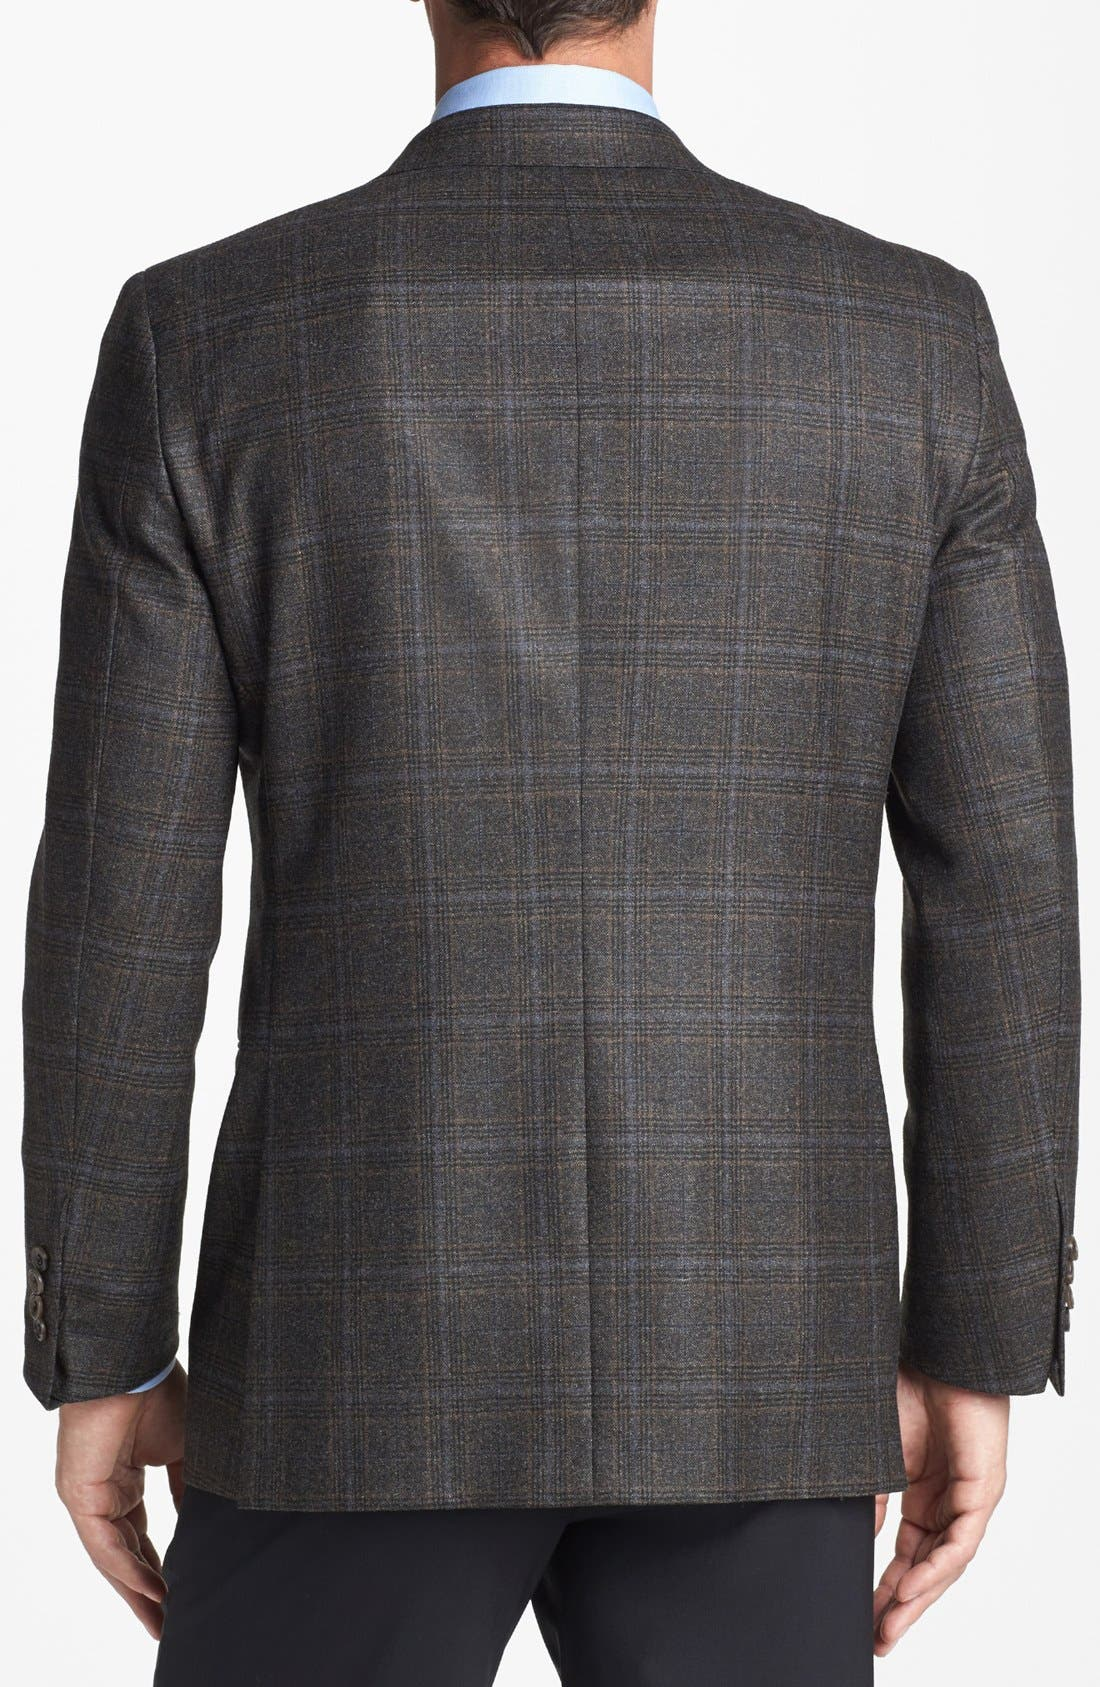 Alternate Image 3  - Hickey Freeman 'B Series' Classic Fit Plaid Sportcoat